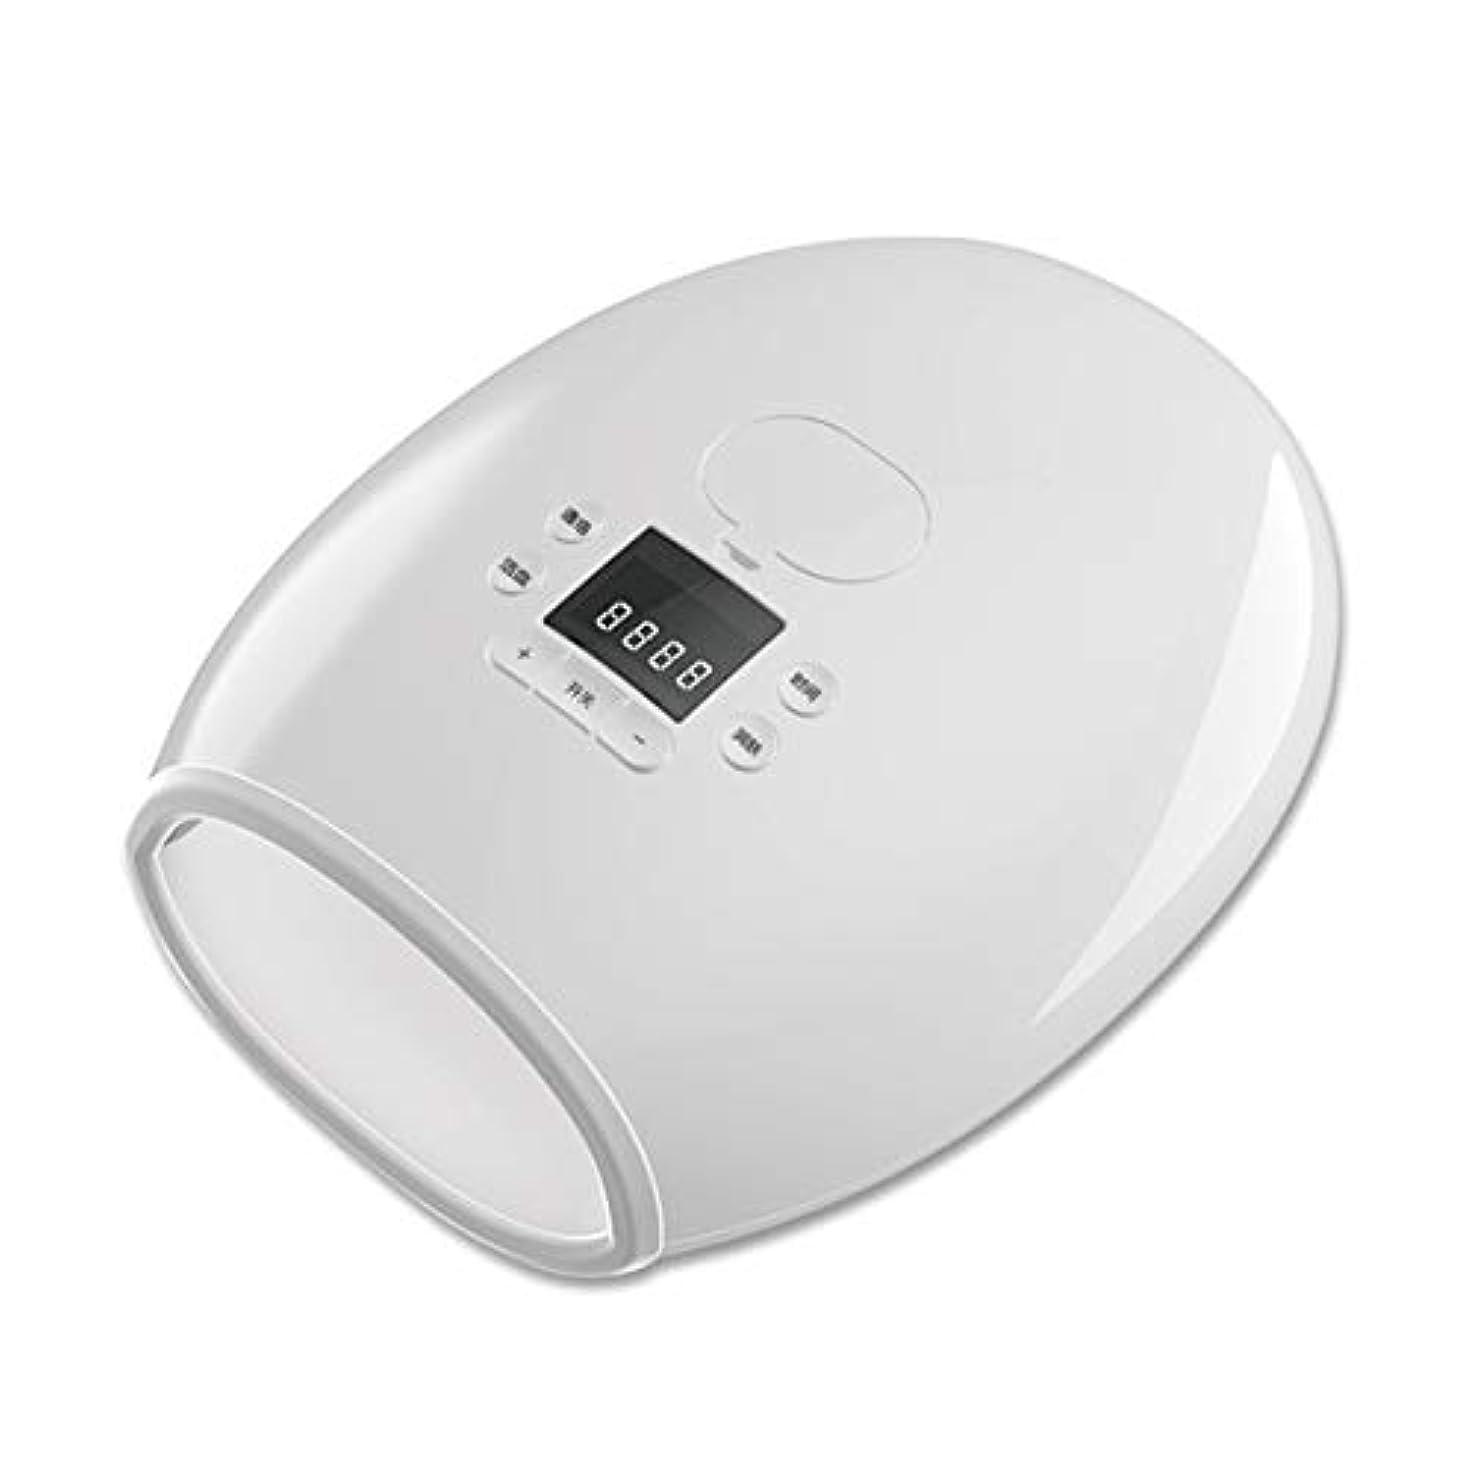 Intercorey Massage Beauty Tool Hand Warm Hand Hydrating Care Palm Massager Hand Electric Heating Massage Instrument